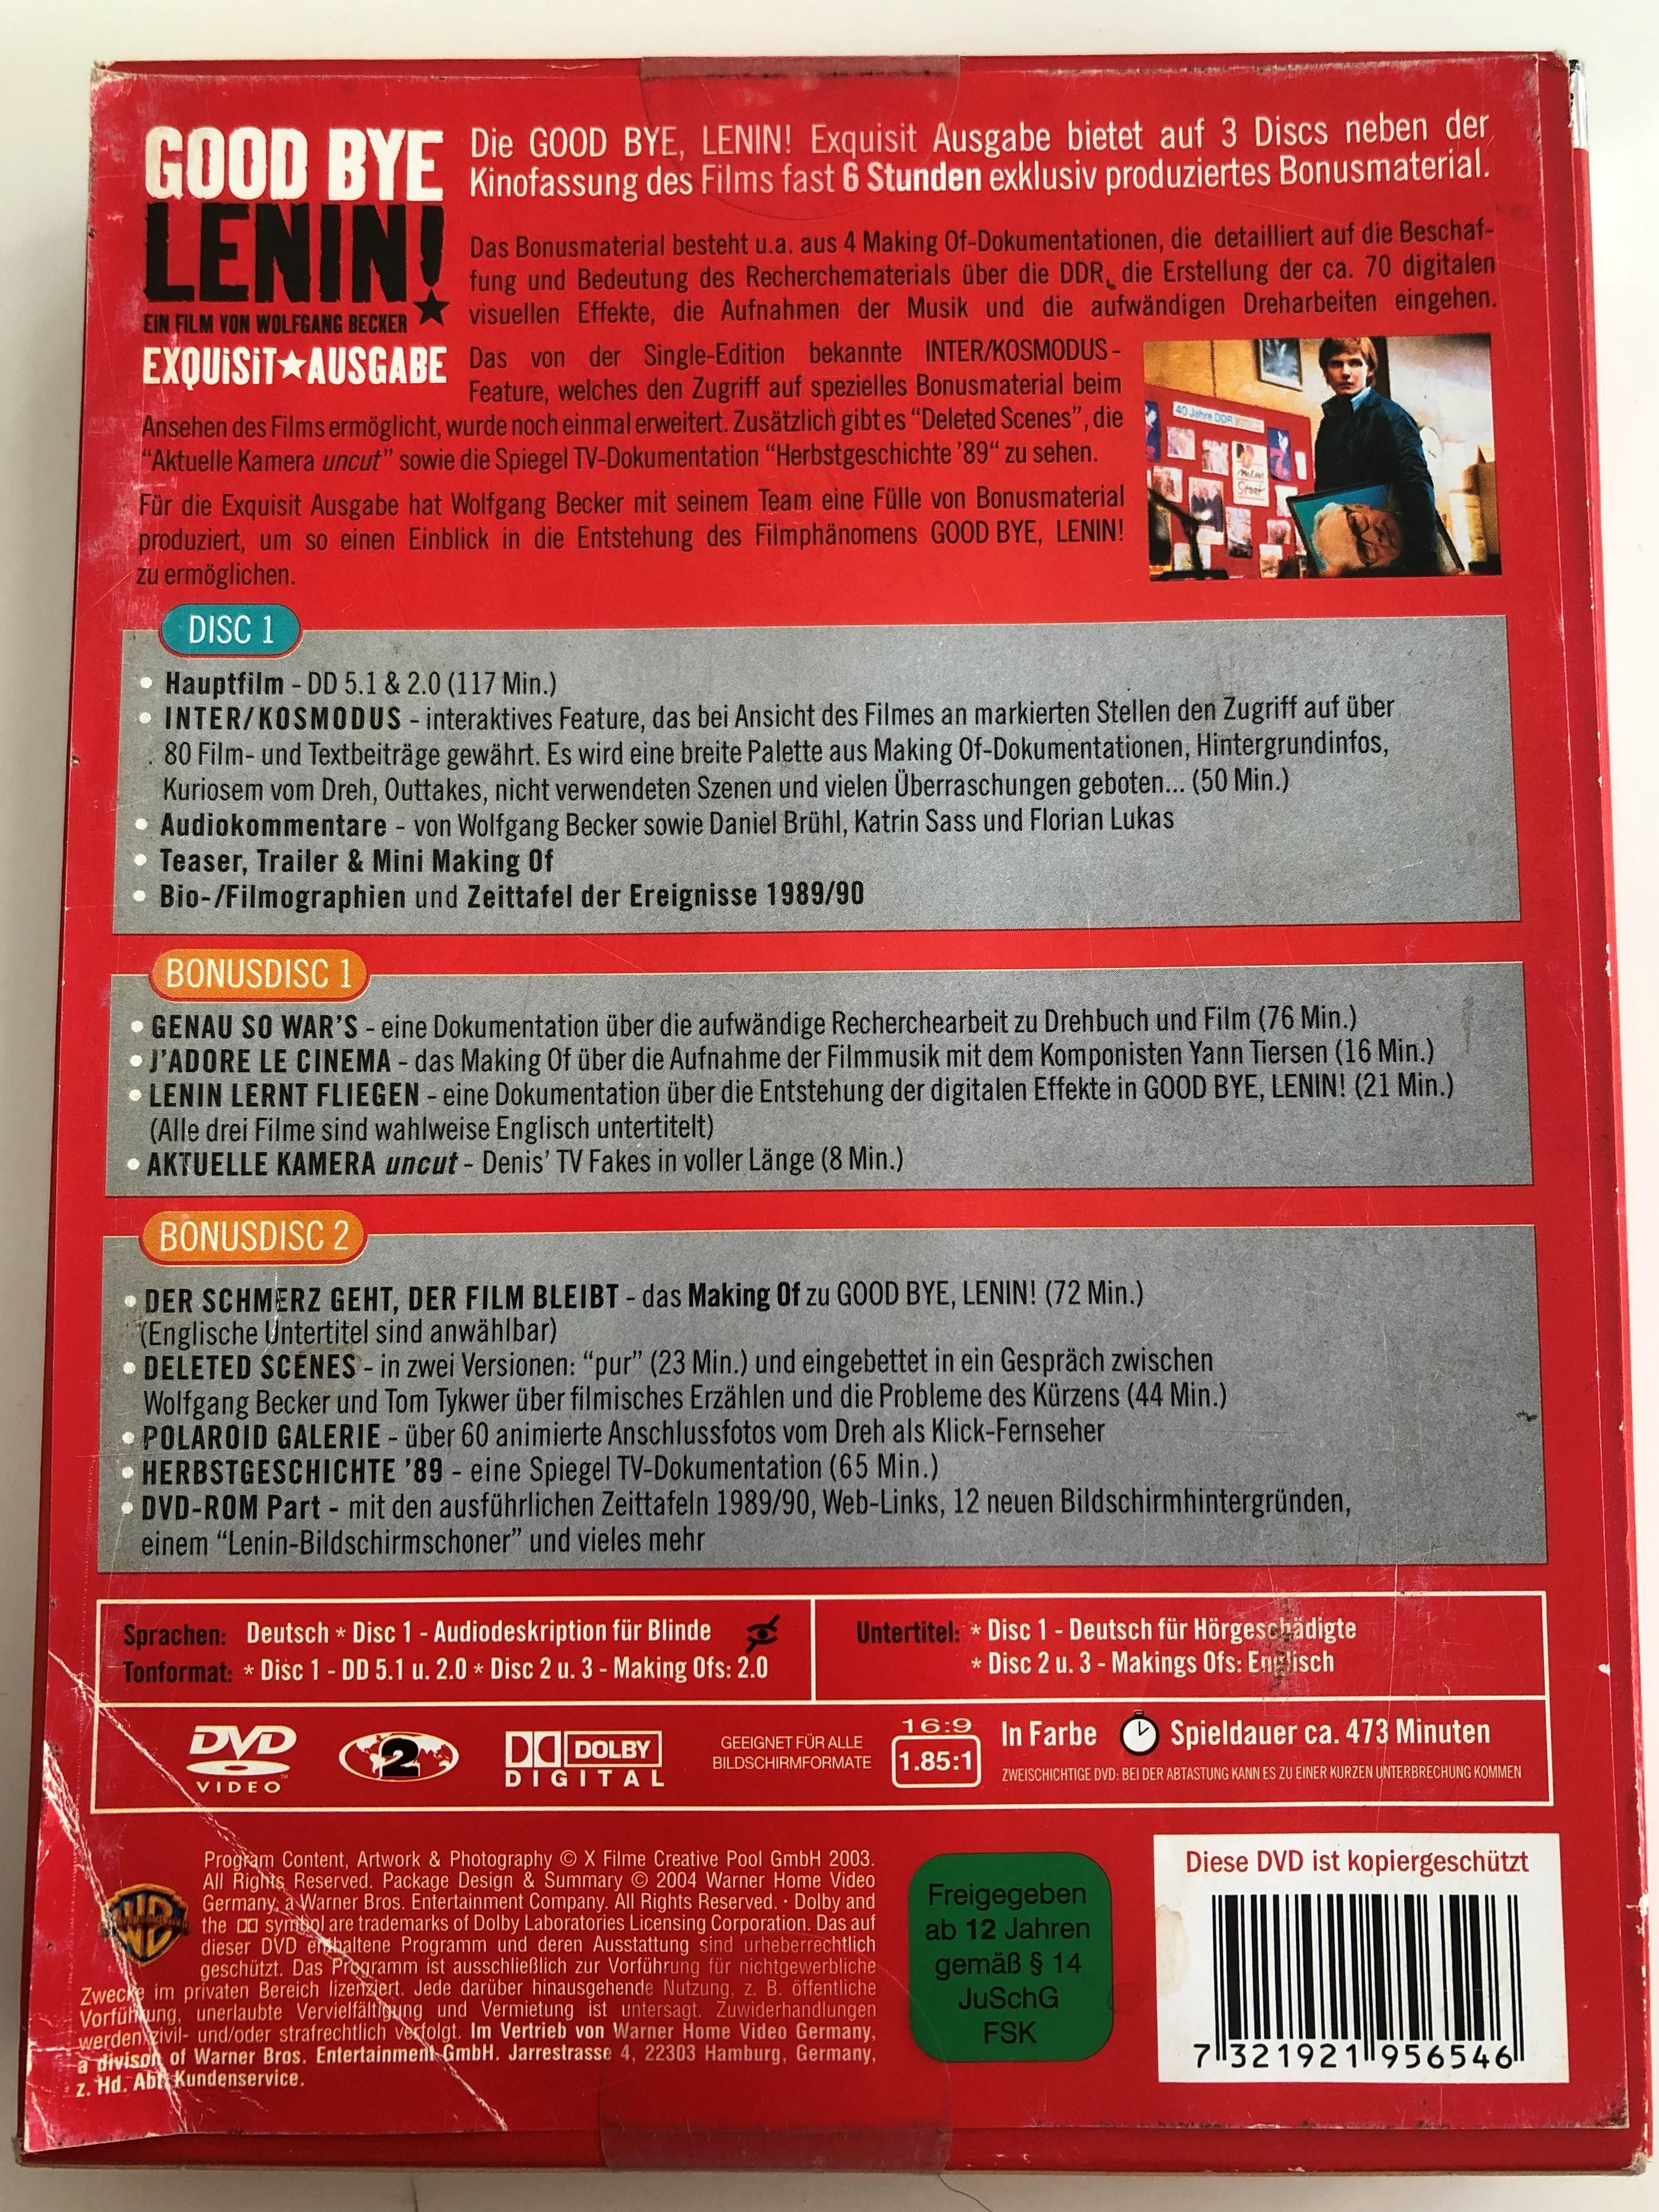 good-bye-lenin-dvd-2003-deluxe-3-disc-edition-directed-by-wolfgang-becker-starring-daniel-br-hl-katrin-sa-chulpan-khamatova-maria-simon-alexander-beyer-exquisit-ausgabe-3-.jpg